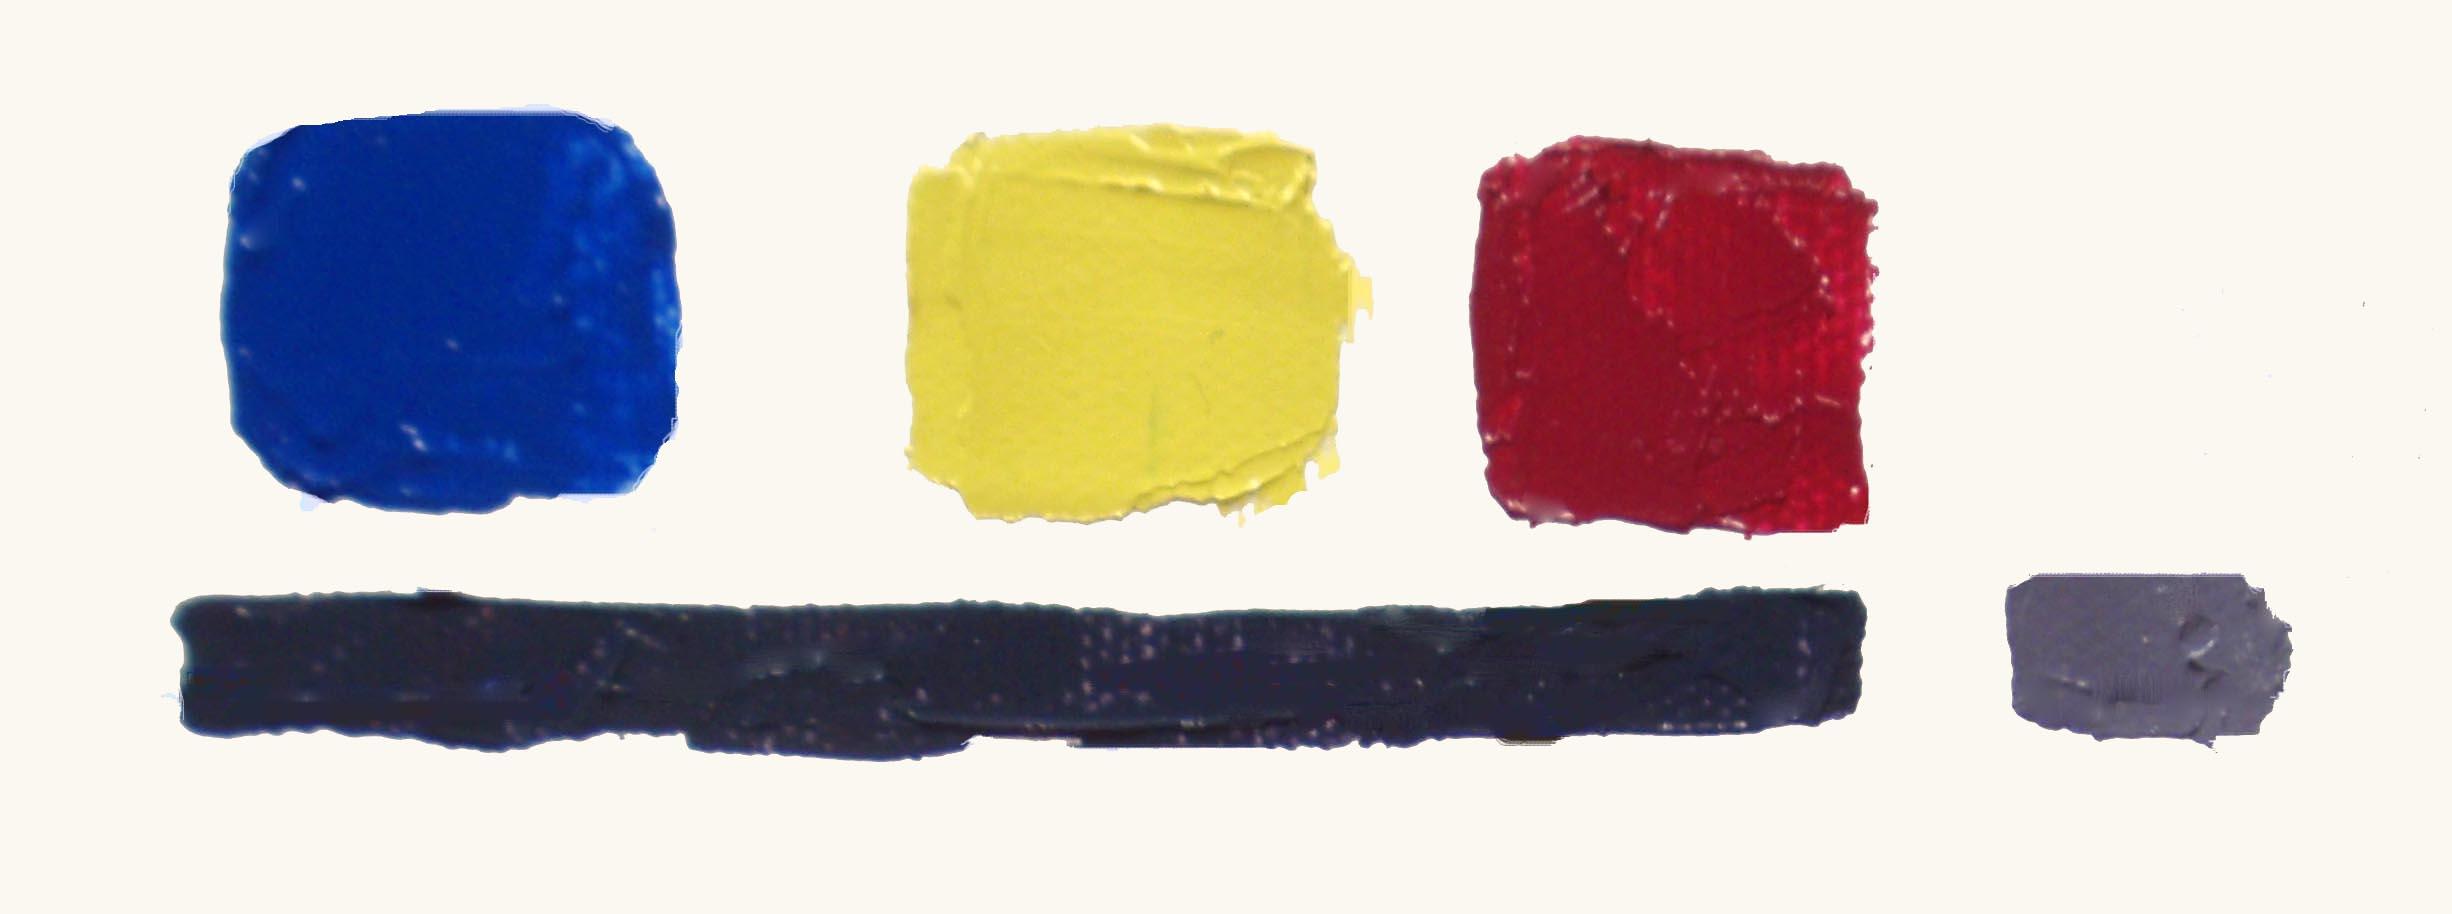 OLYMPUS DIGITAL CAMERA Celebrating Color